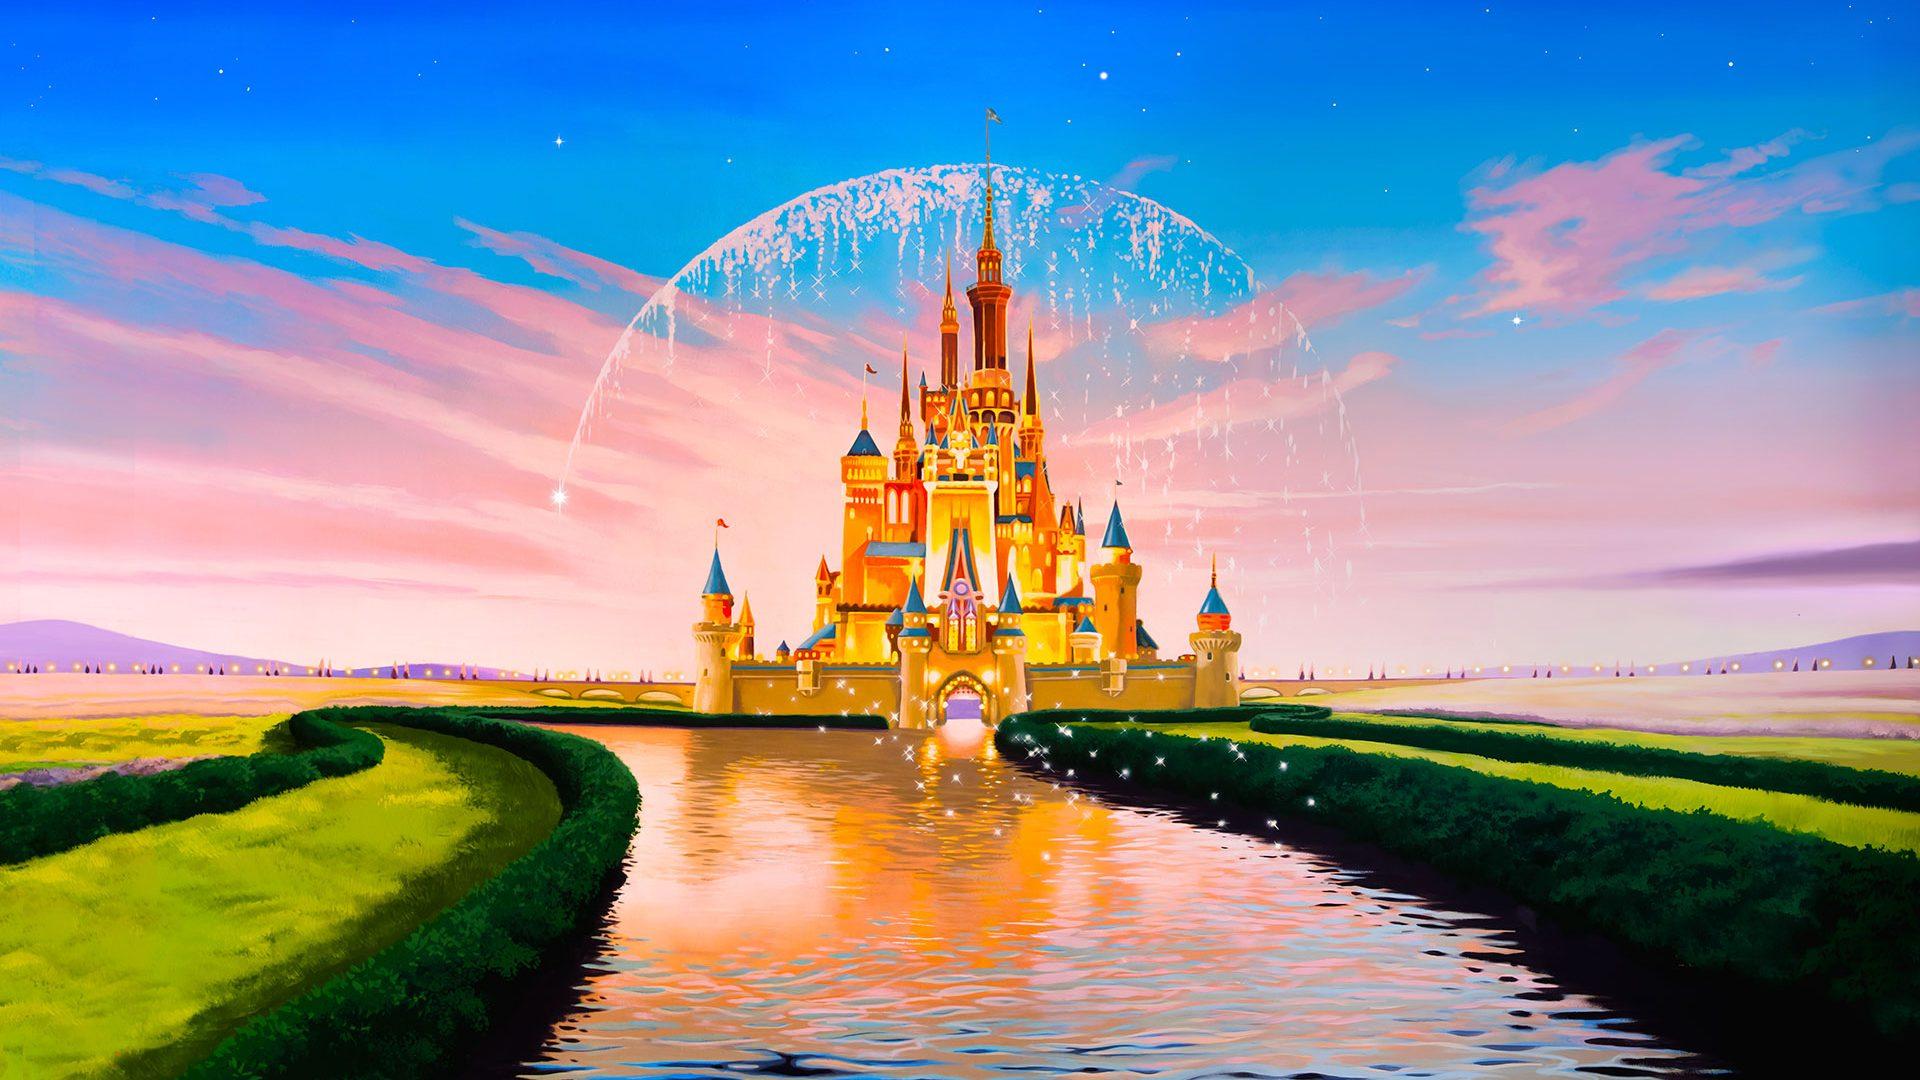 Cute Mickey Wallpapers Disney Computer Wallpapers Hd Pixelstalk Net